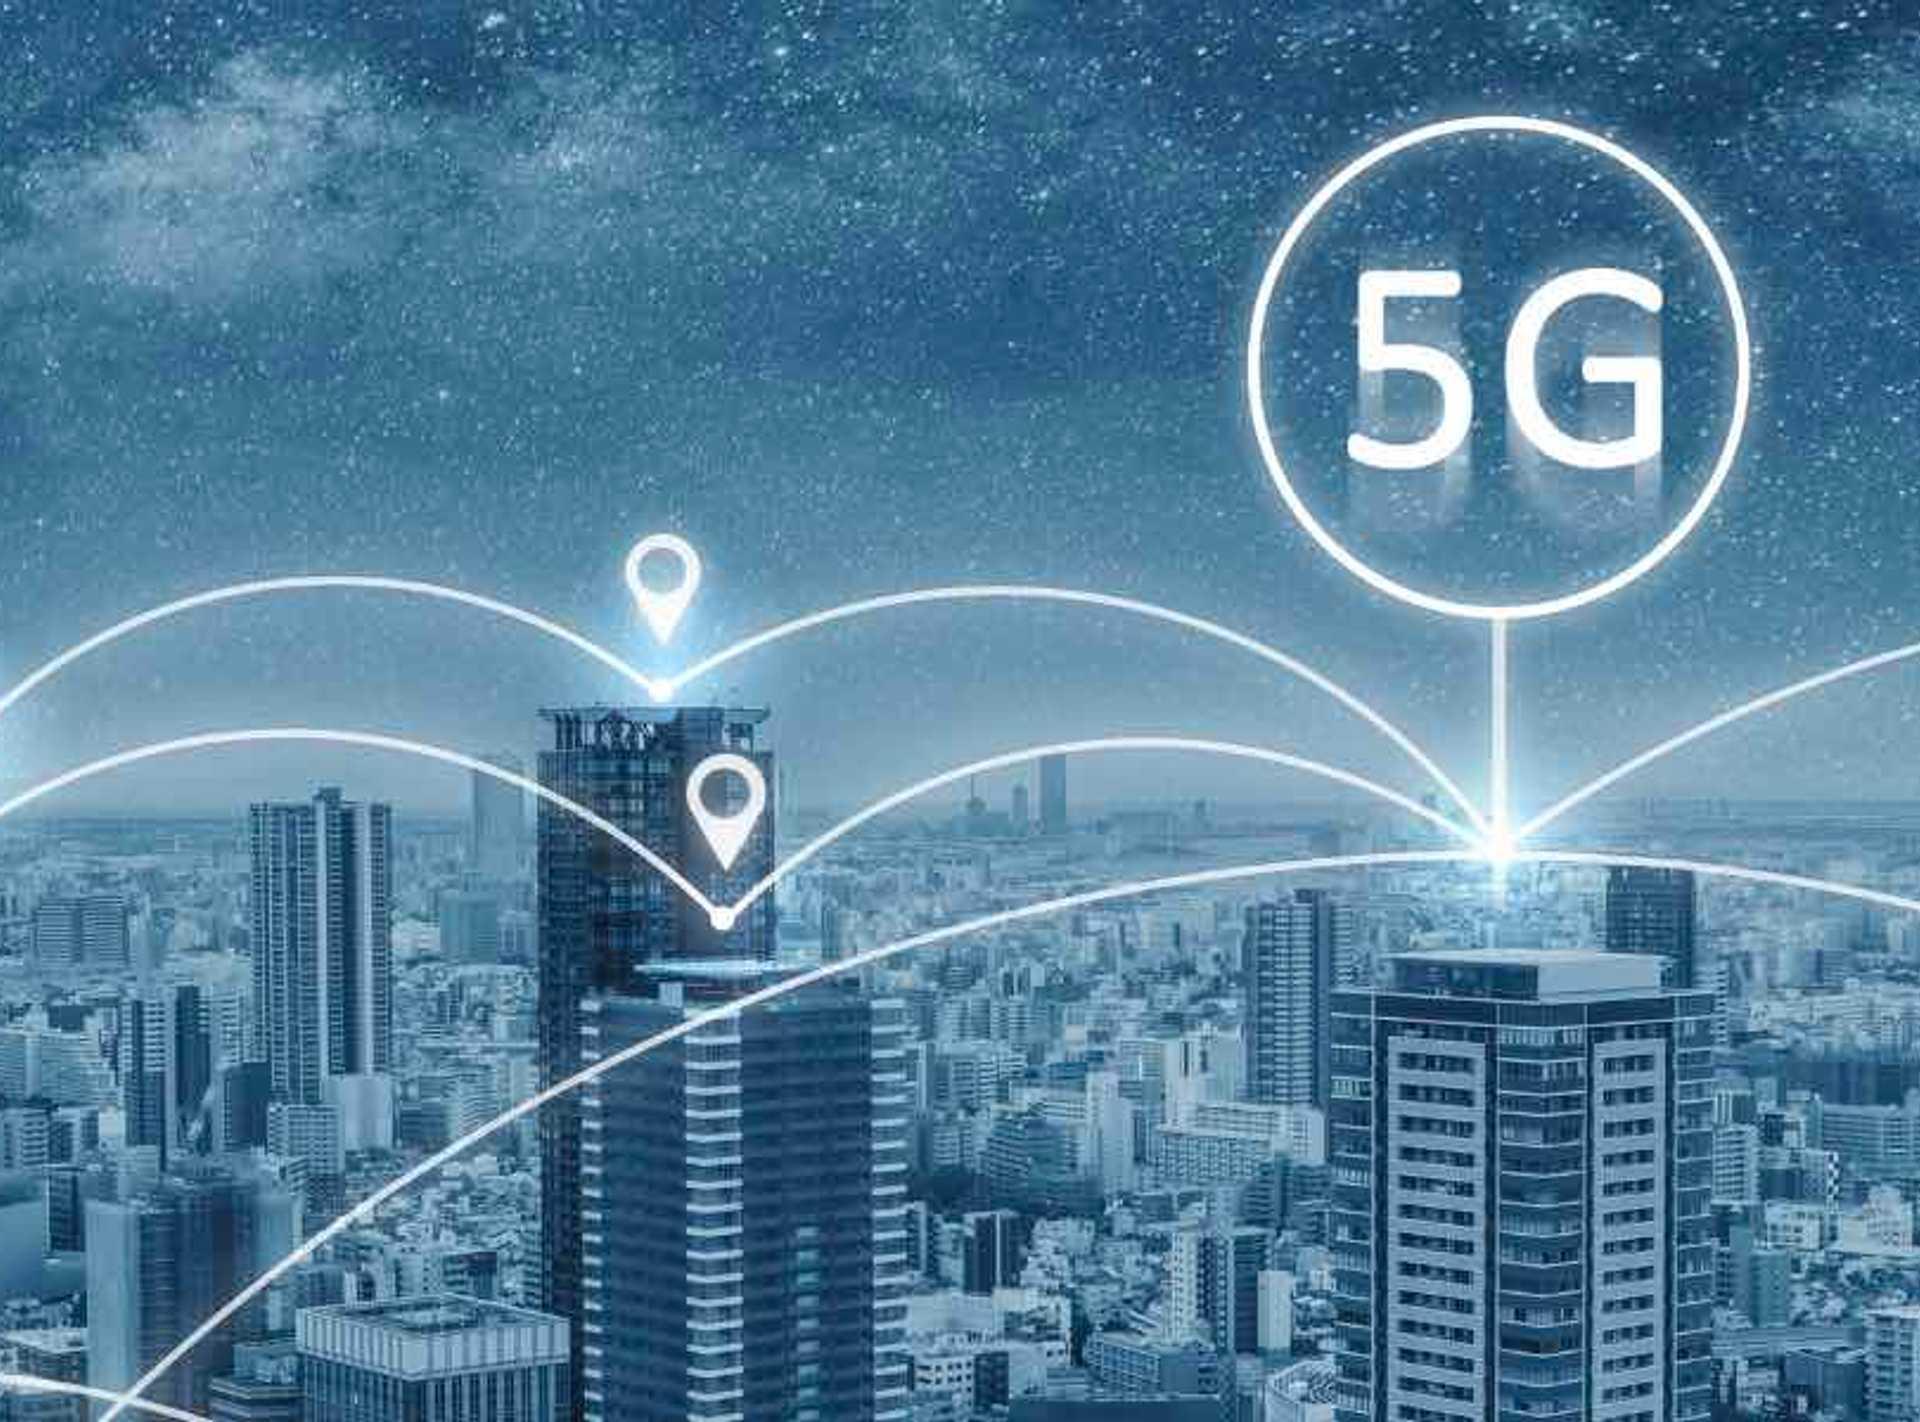 Accruent - Resources - Webinars - How 5G Will Revolutionize IoT - Hero